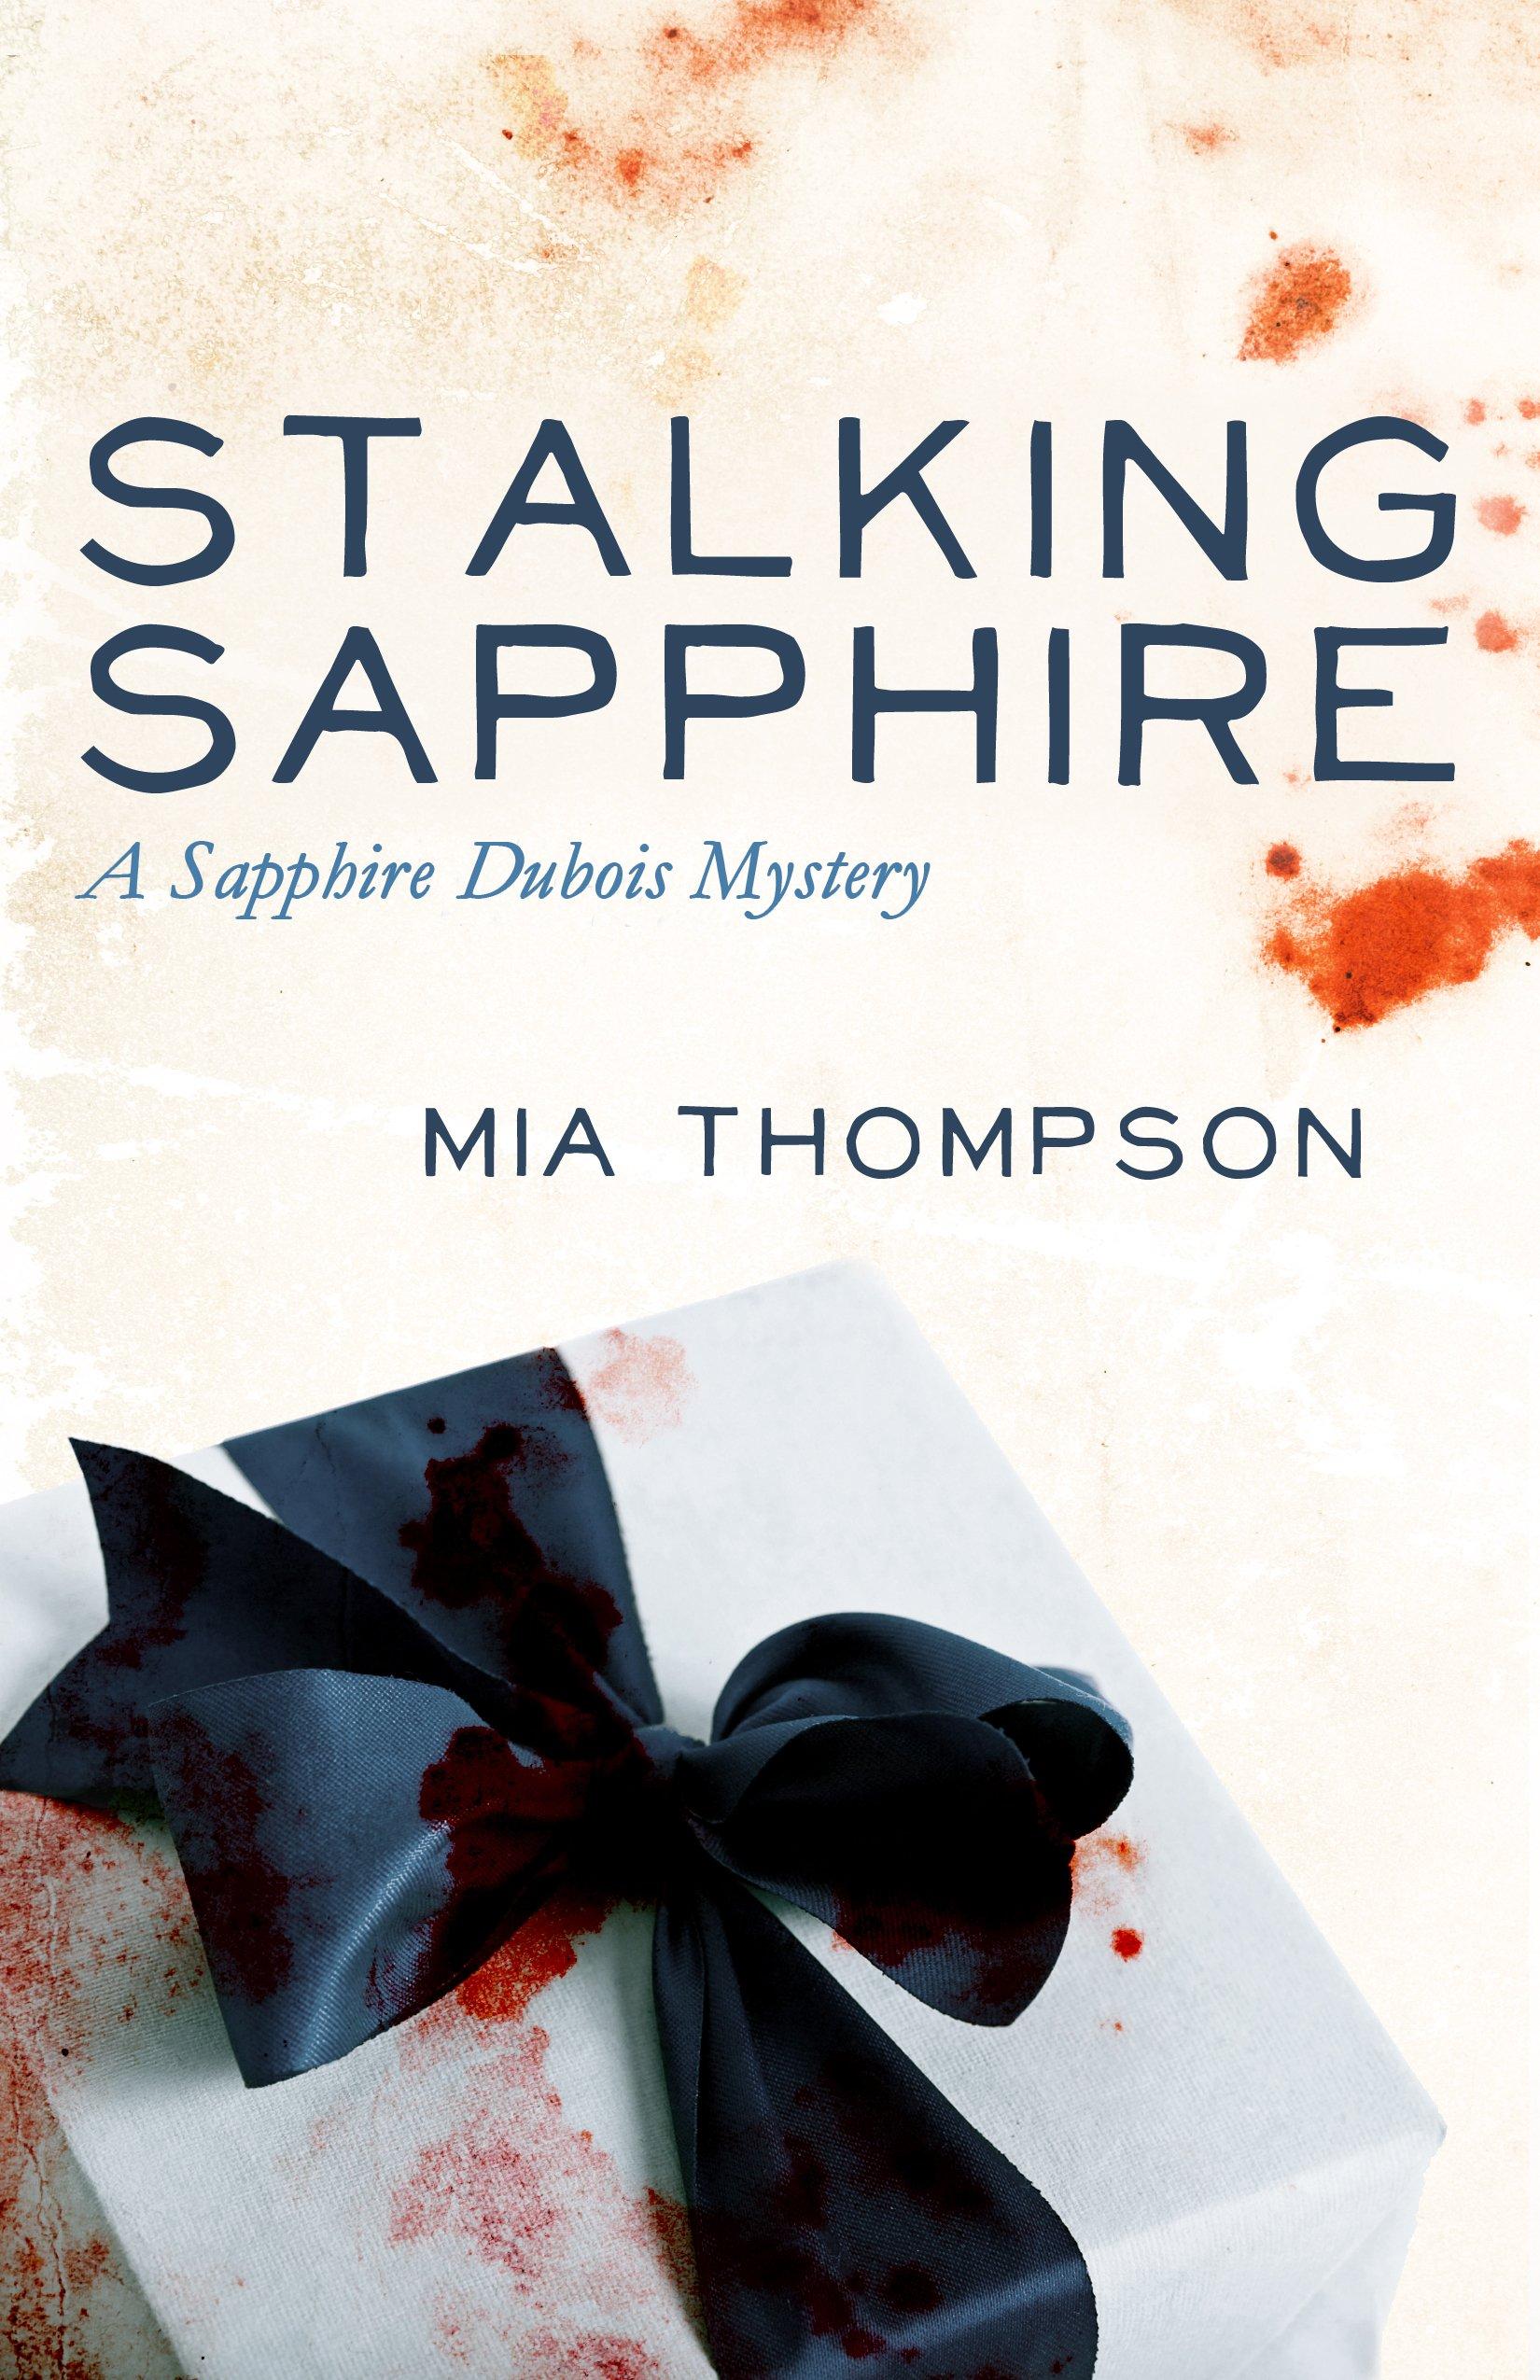 Stalking Sapphire: A Sapphire Dubois Mystery (Sapphire Dubois Mysteries):  Amazon.co.uk: Mia Thompson: 9781626812116: Books